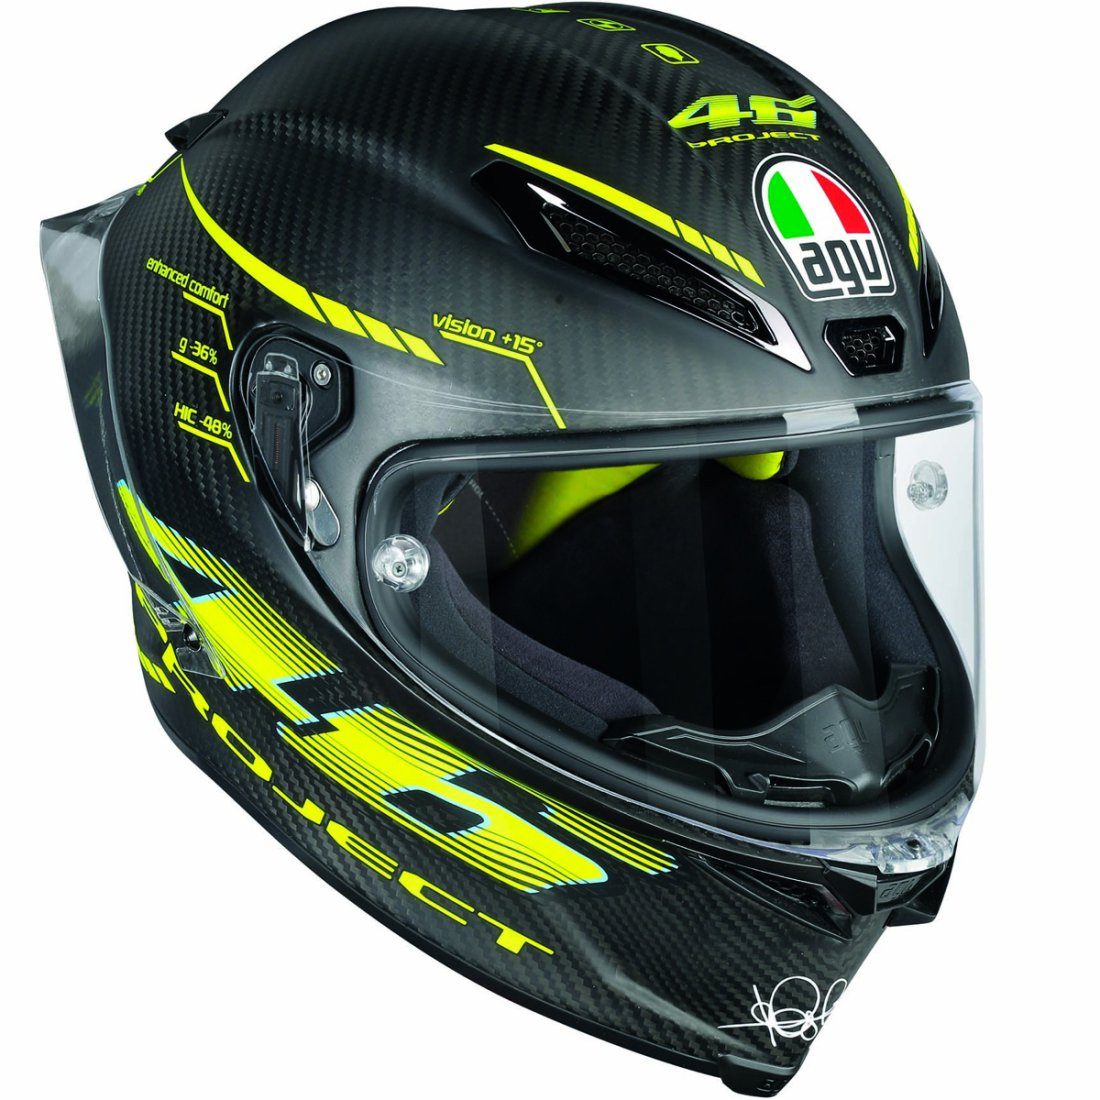 AGV Pista GP R Rossi Project 46 2.0 Helmet